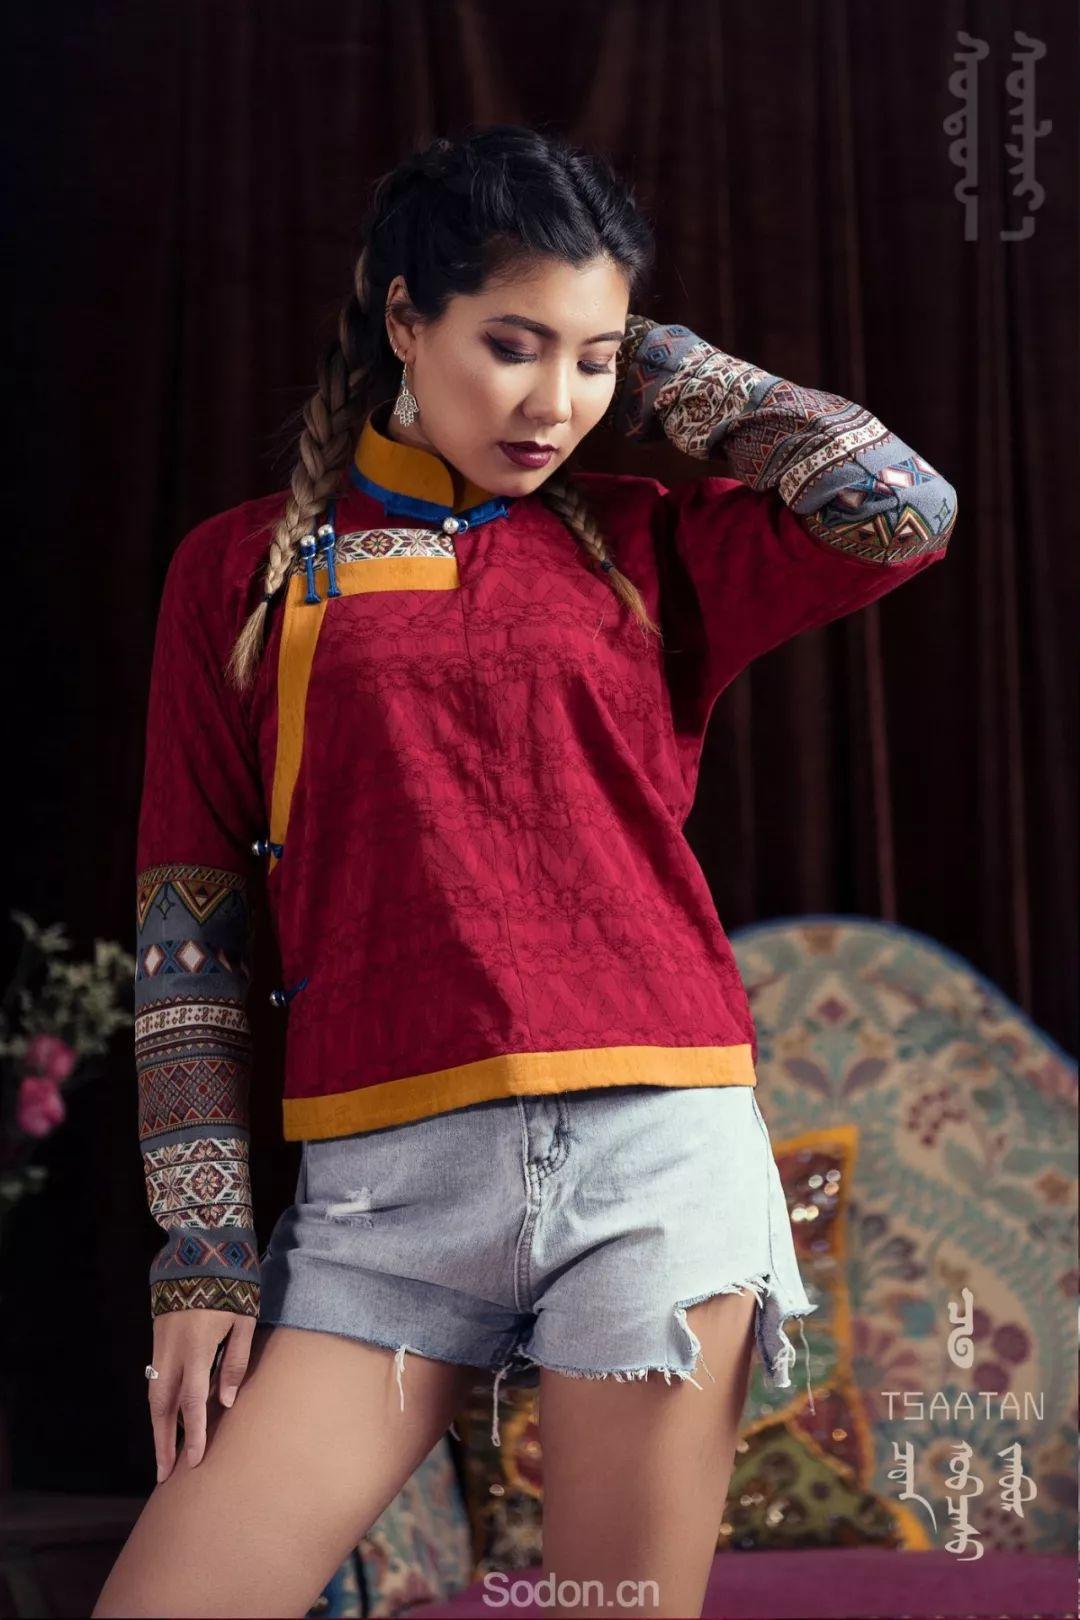 TSAATAN蒙古时装 2019夏季新款首发 第34张